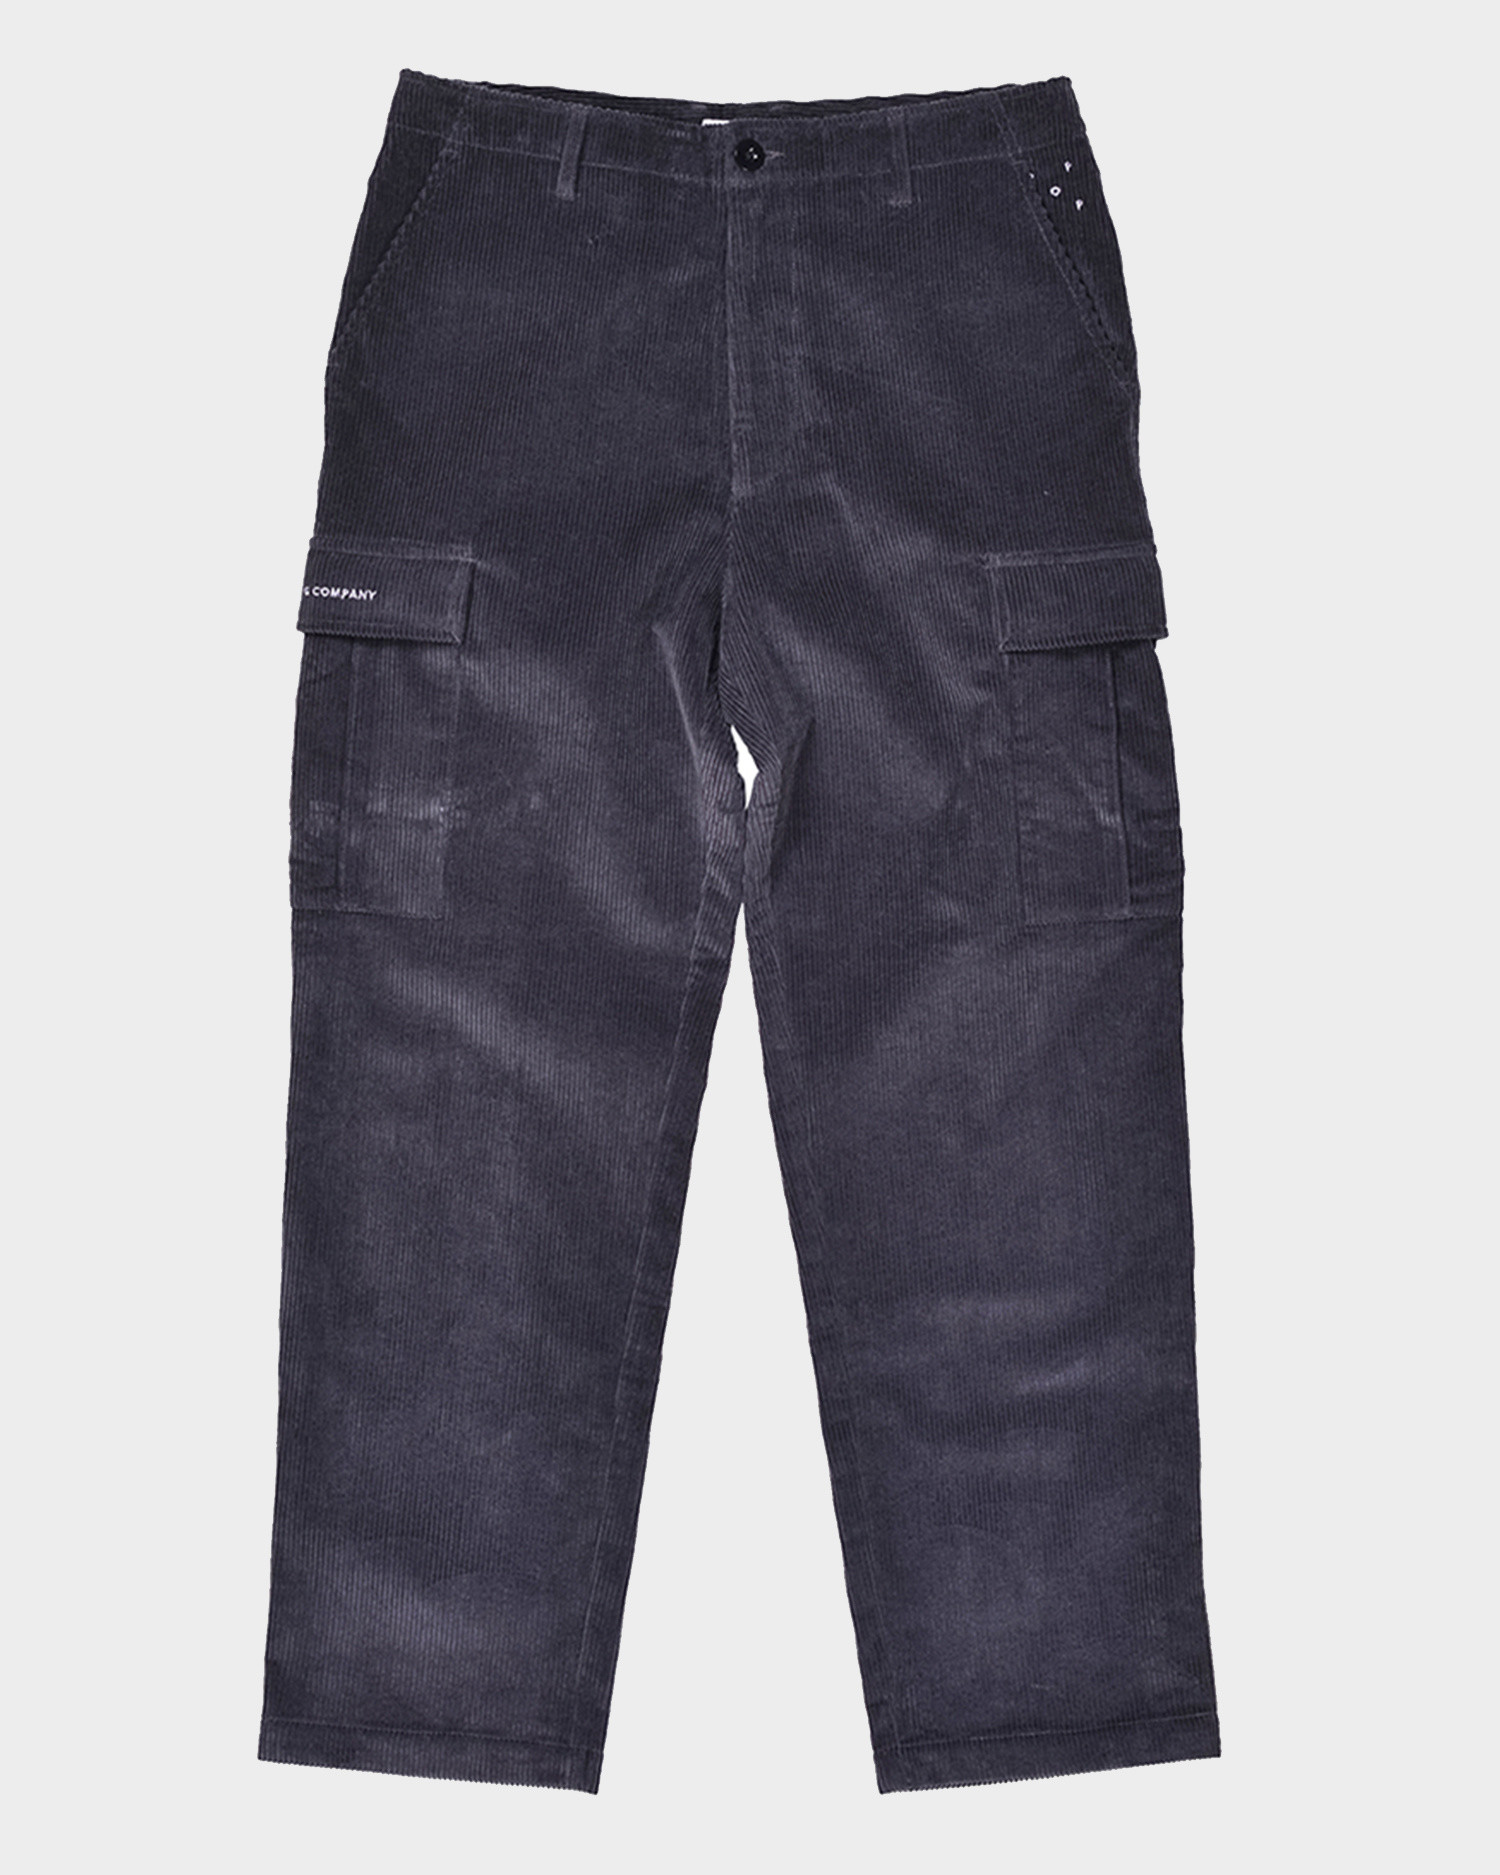 Pop Trading Company Corduroy Cargo Pants Anthracite